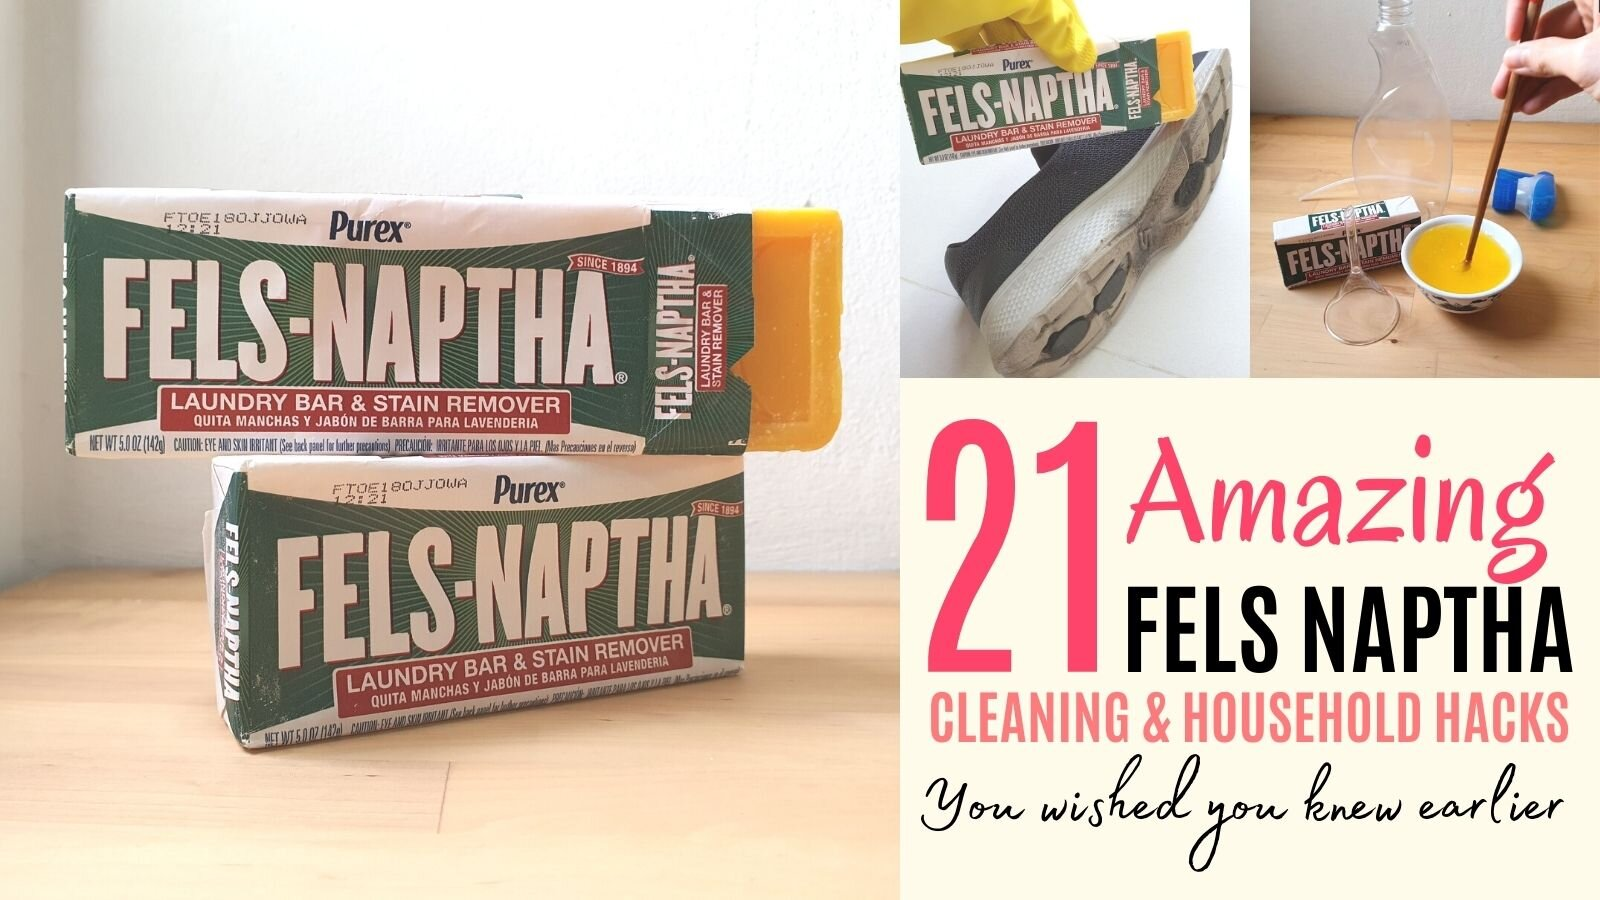 fels naptha uses.jpg